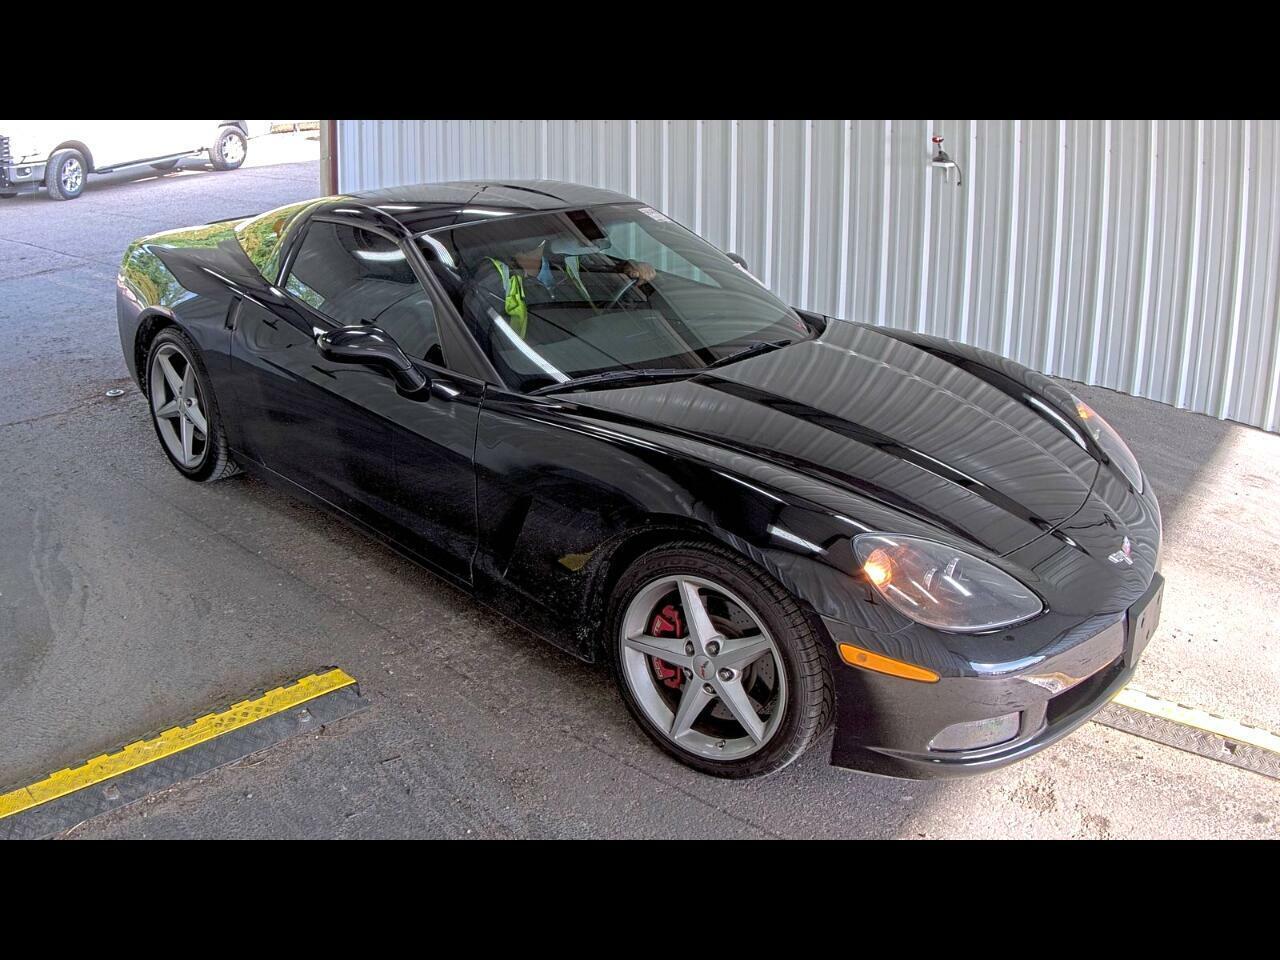 2013 Black Chevrolet Corvette   | C6 Corvette Photo 2